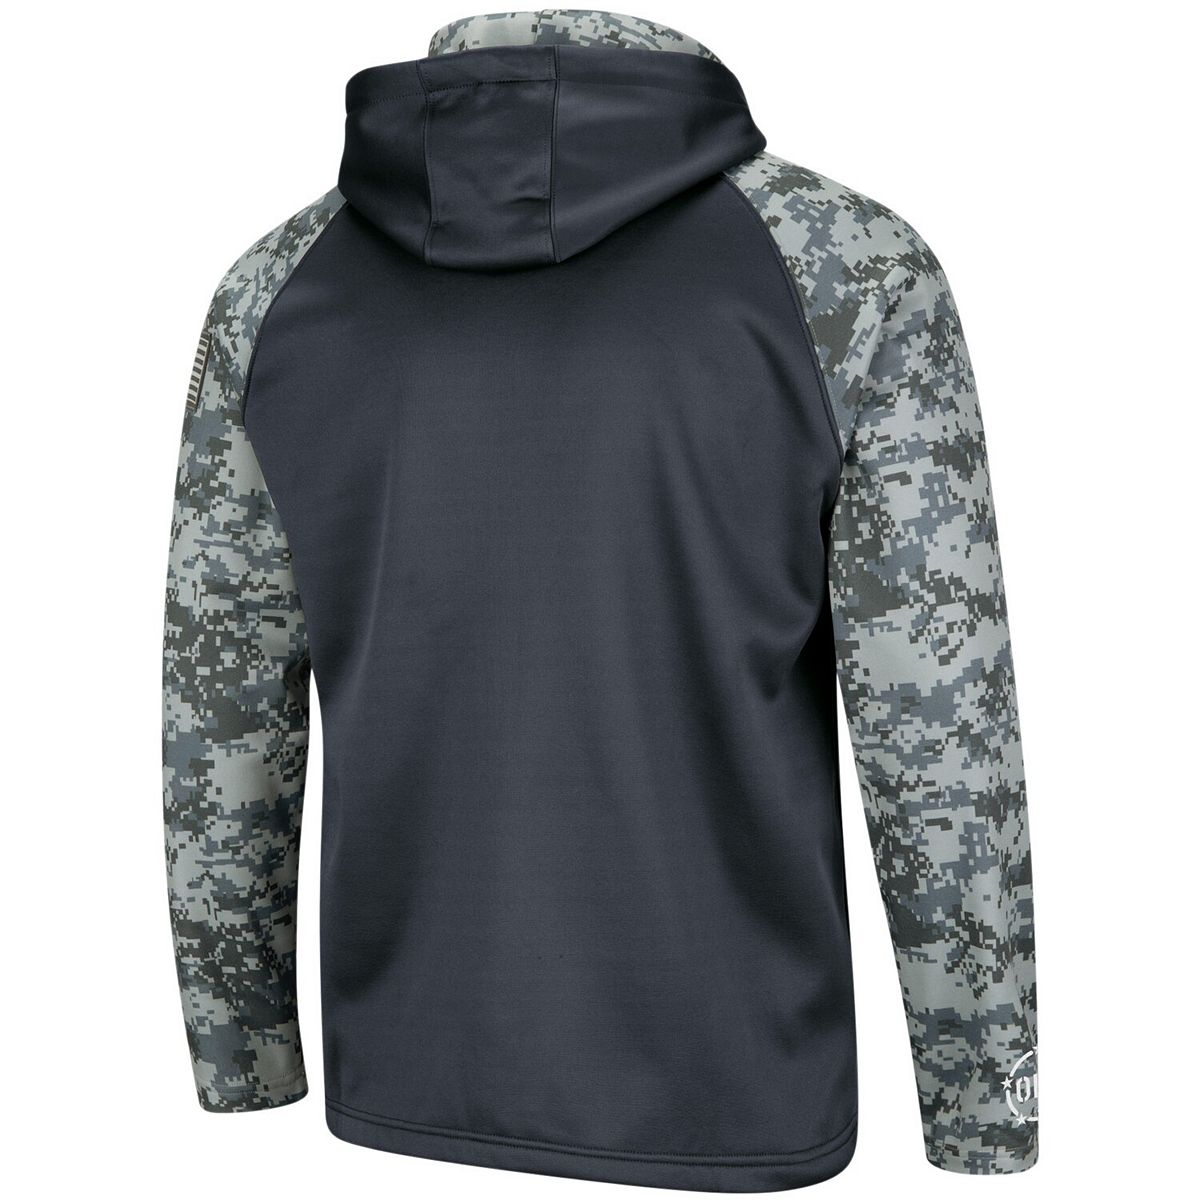 Men's Colosseum Charcoal/Camo Illinois Fighting Illini OHT Military Appreciation Digi Camo Raglan Full-Zip Hoodie Vooms